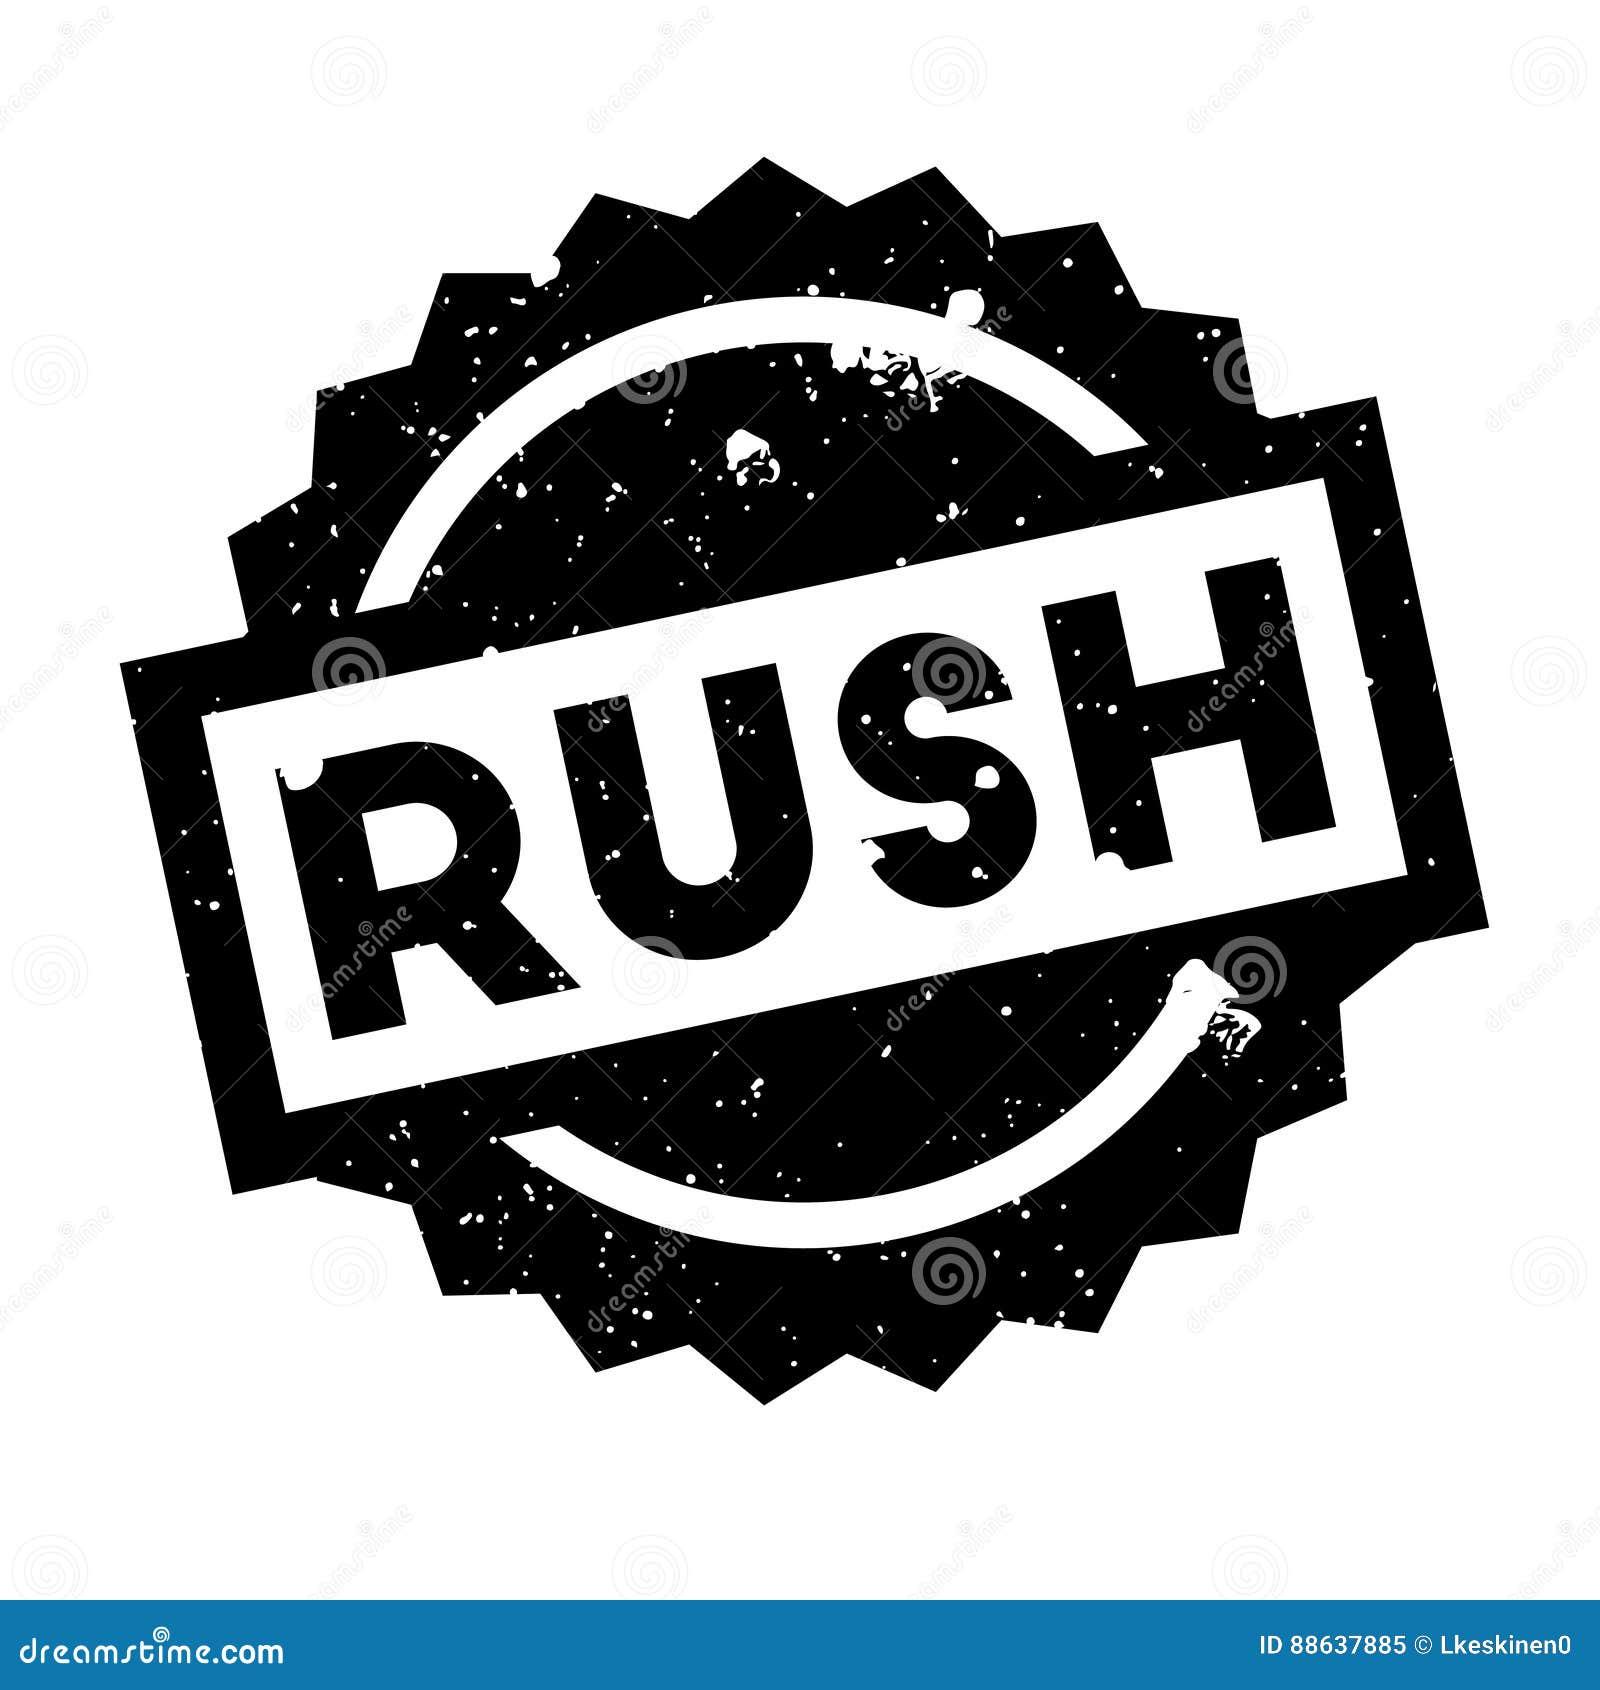 rush essay sign in We provide write seo content tips  contact us: alsav1909@gmailcom even more news.